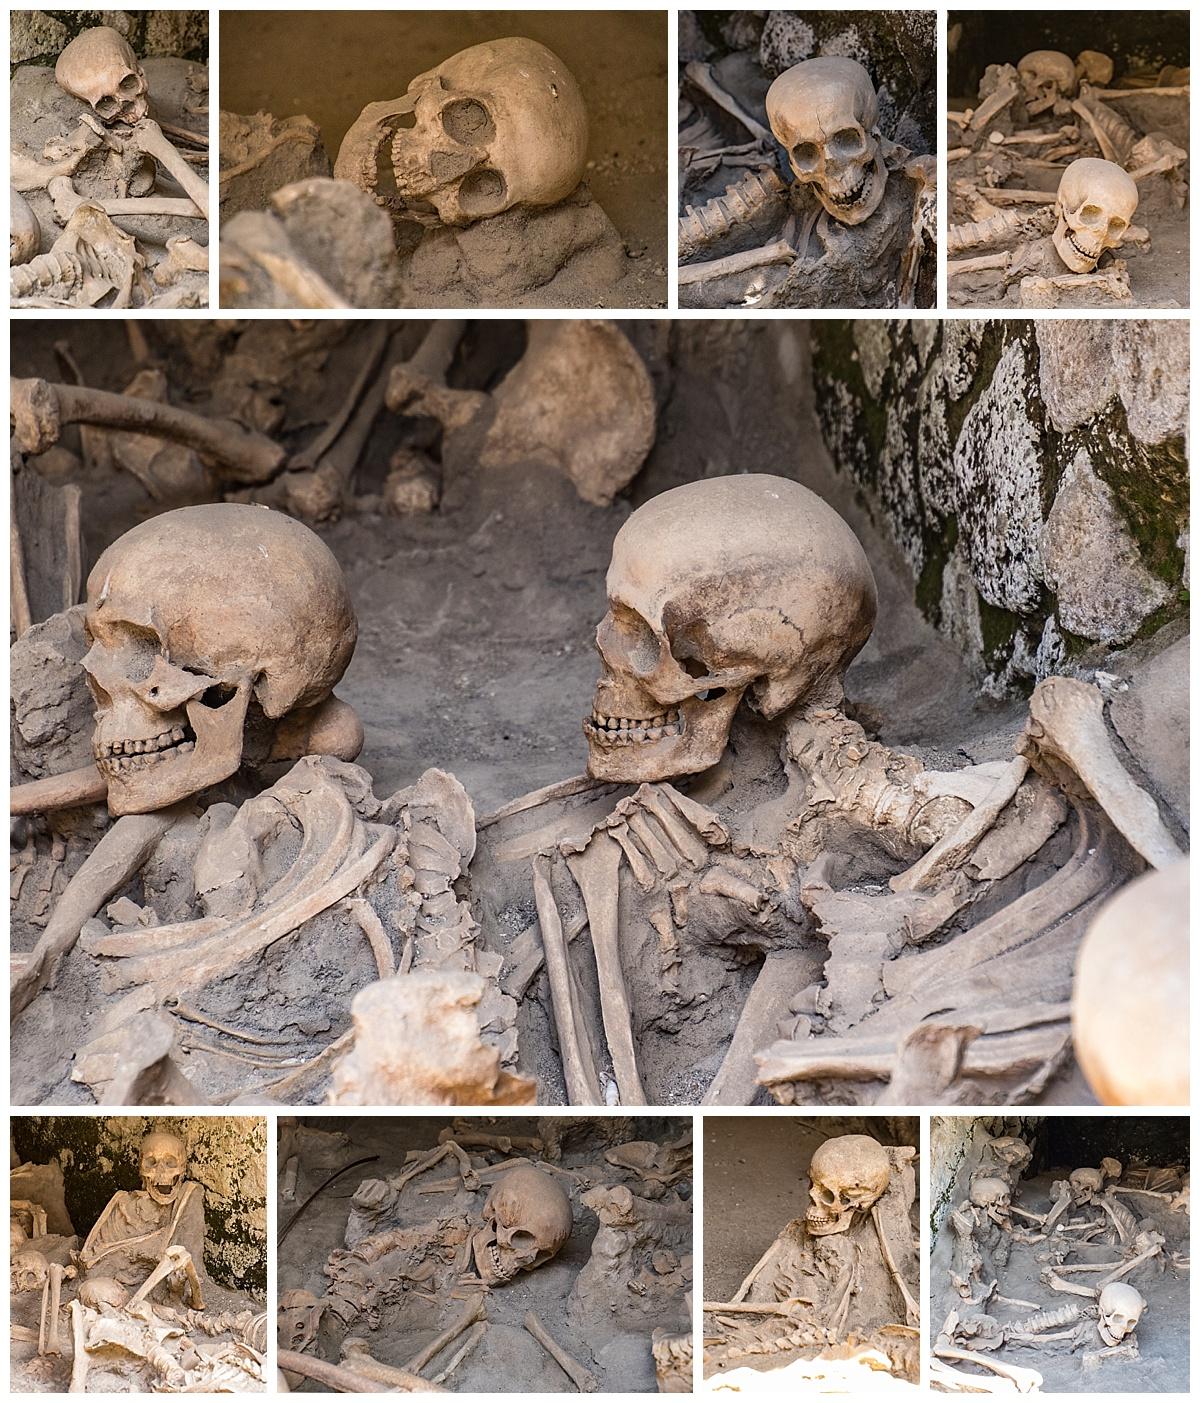 Herculaneum, Italy - bones